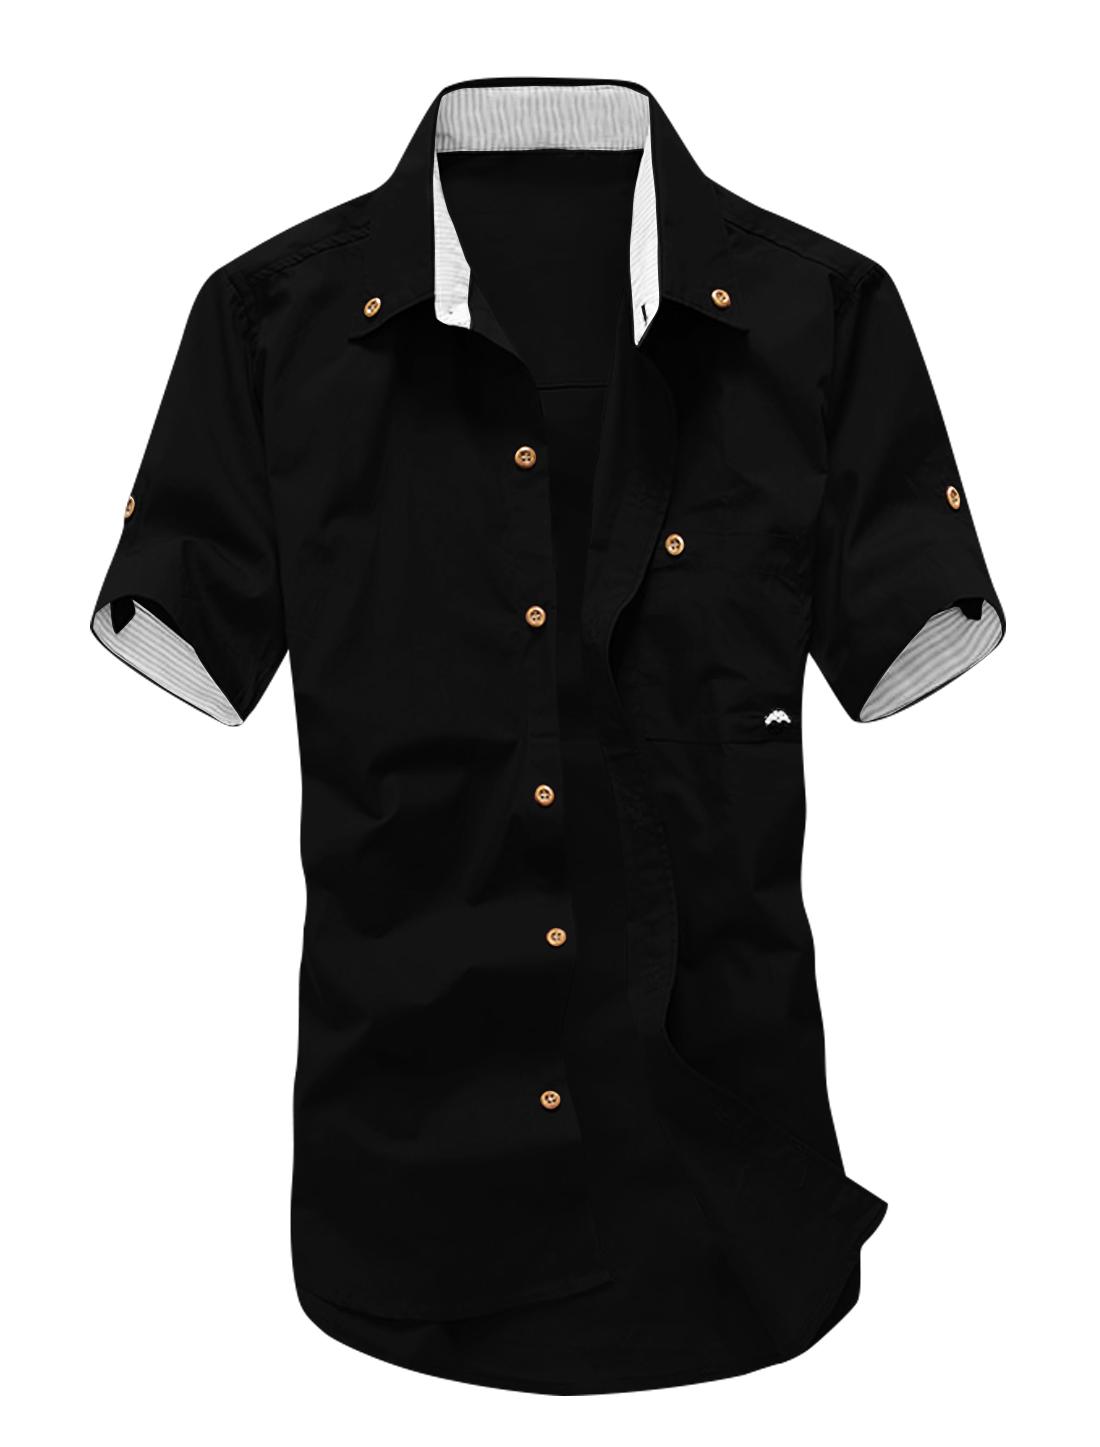 Man Short Sleeves Stitching Detail Button Down Shirts Brick Red M